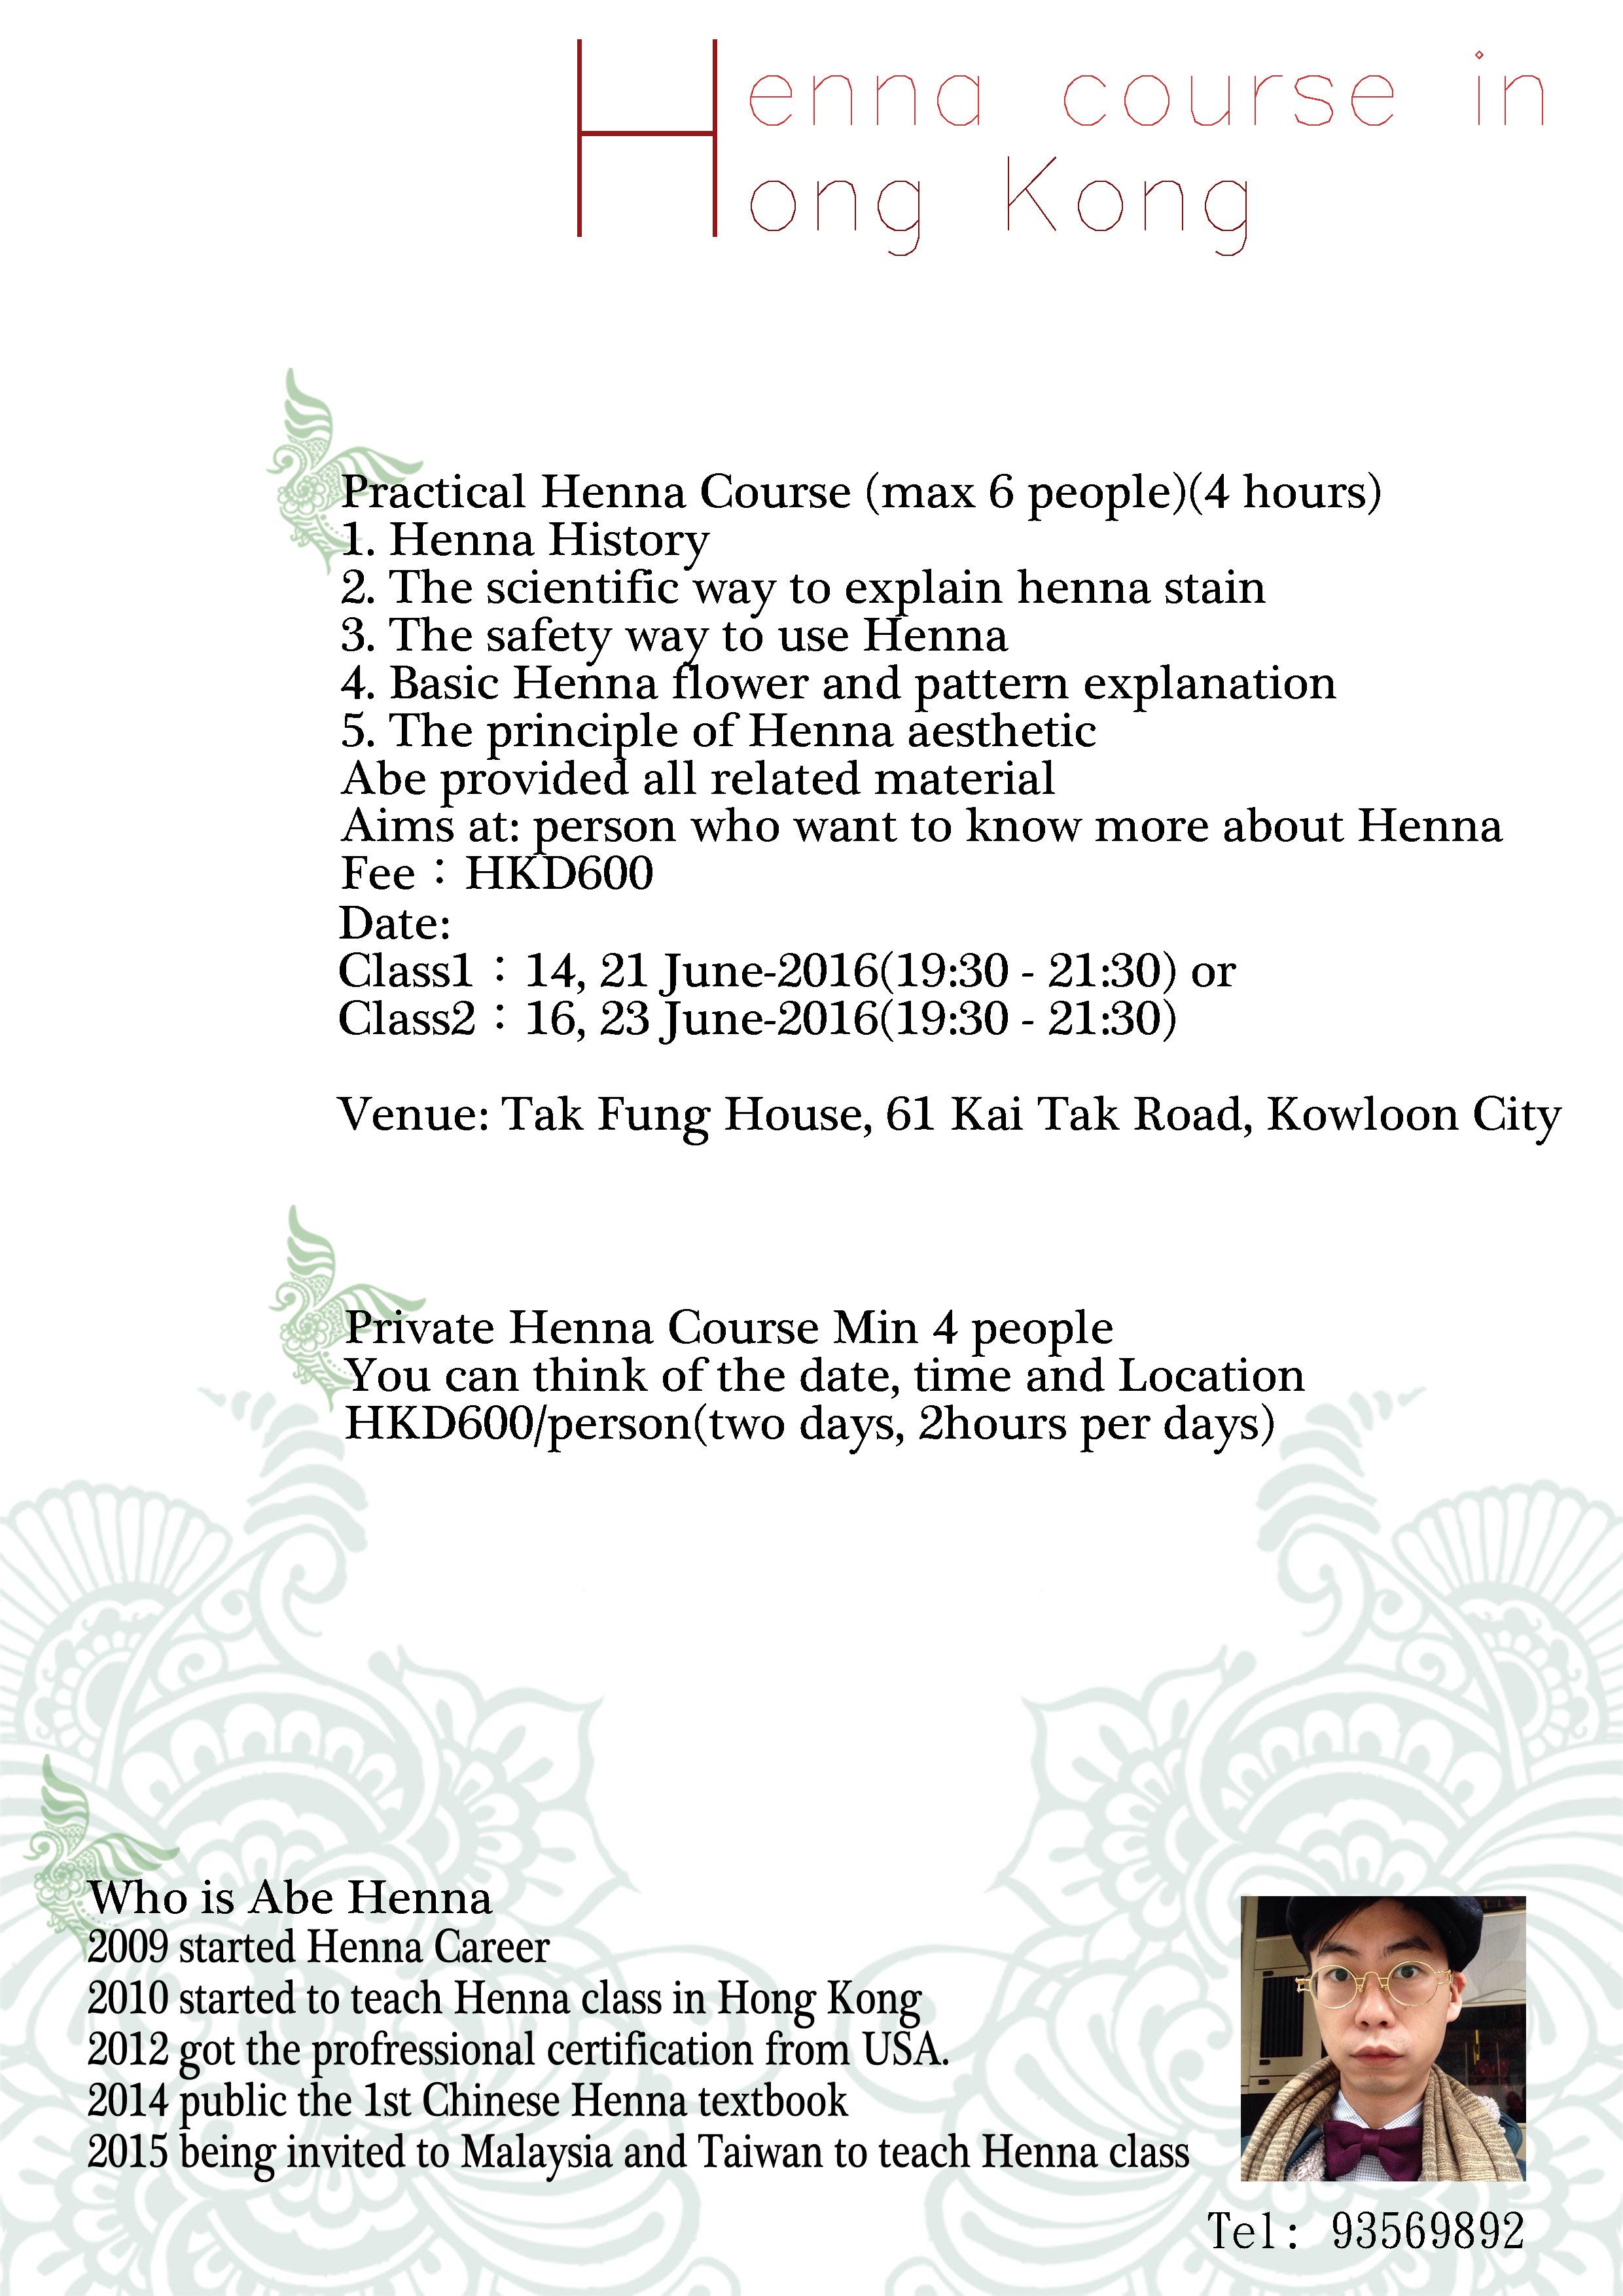 Henna course in Hong Kong Eng